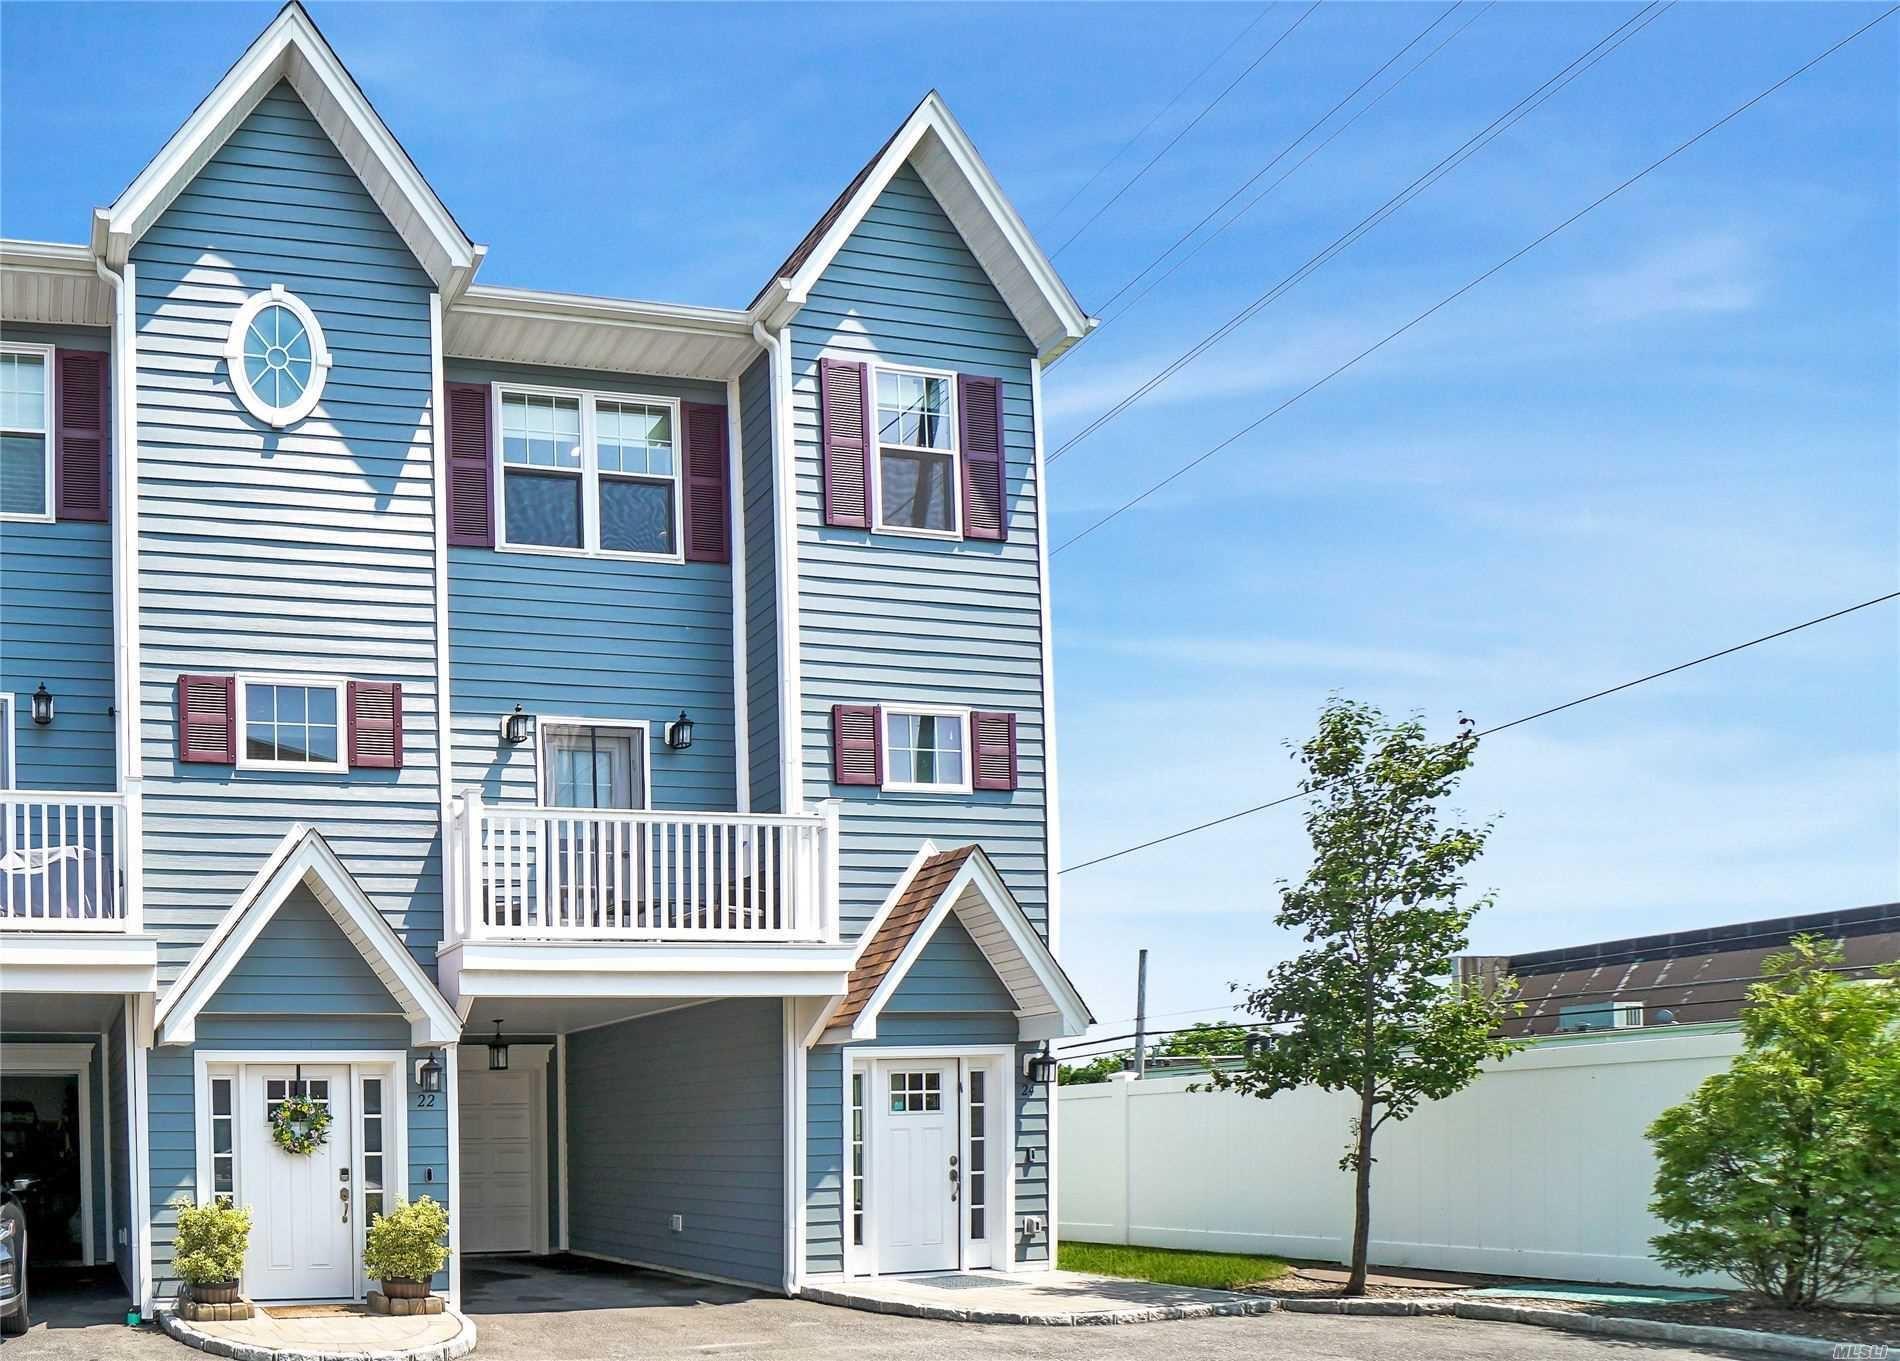 24 Hearthstone Court, Farmingdale, NY 11735 - MLS#: 3229299